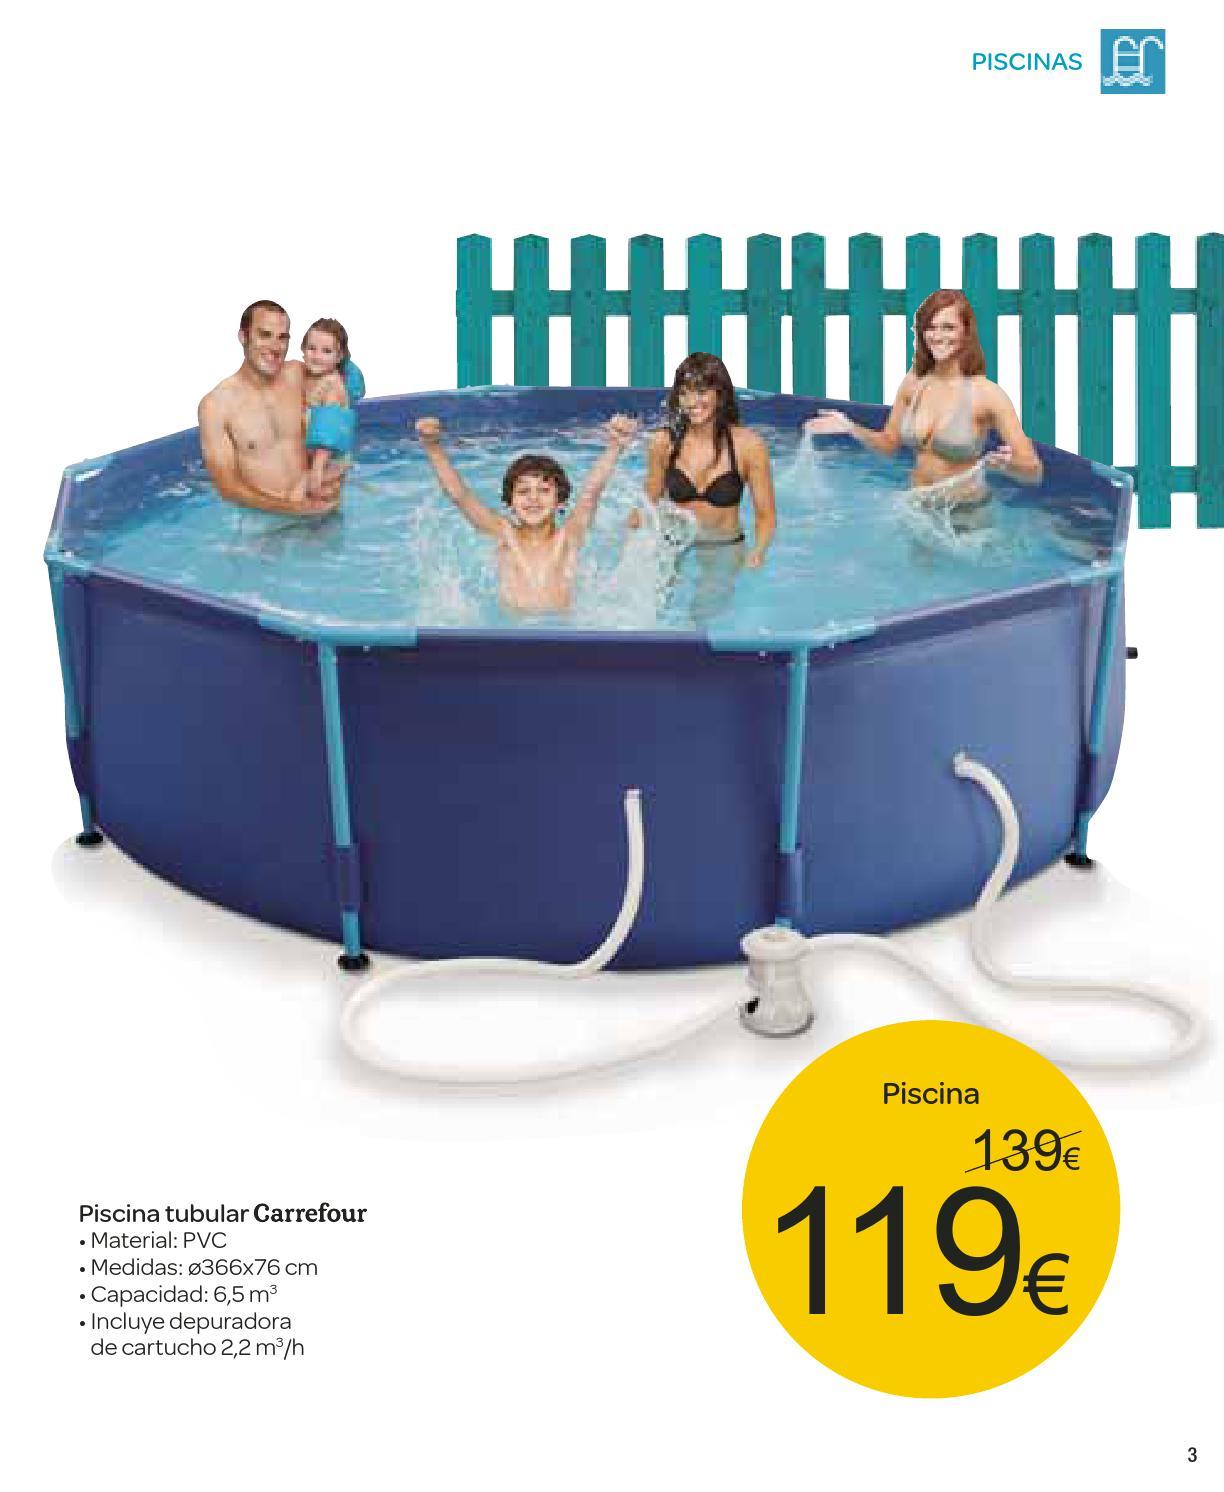 catalogo ofertas carrefour junio 2013 by Carrefour Online ...